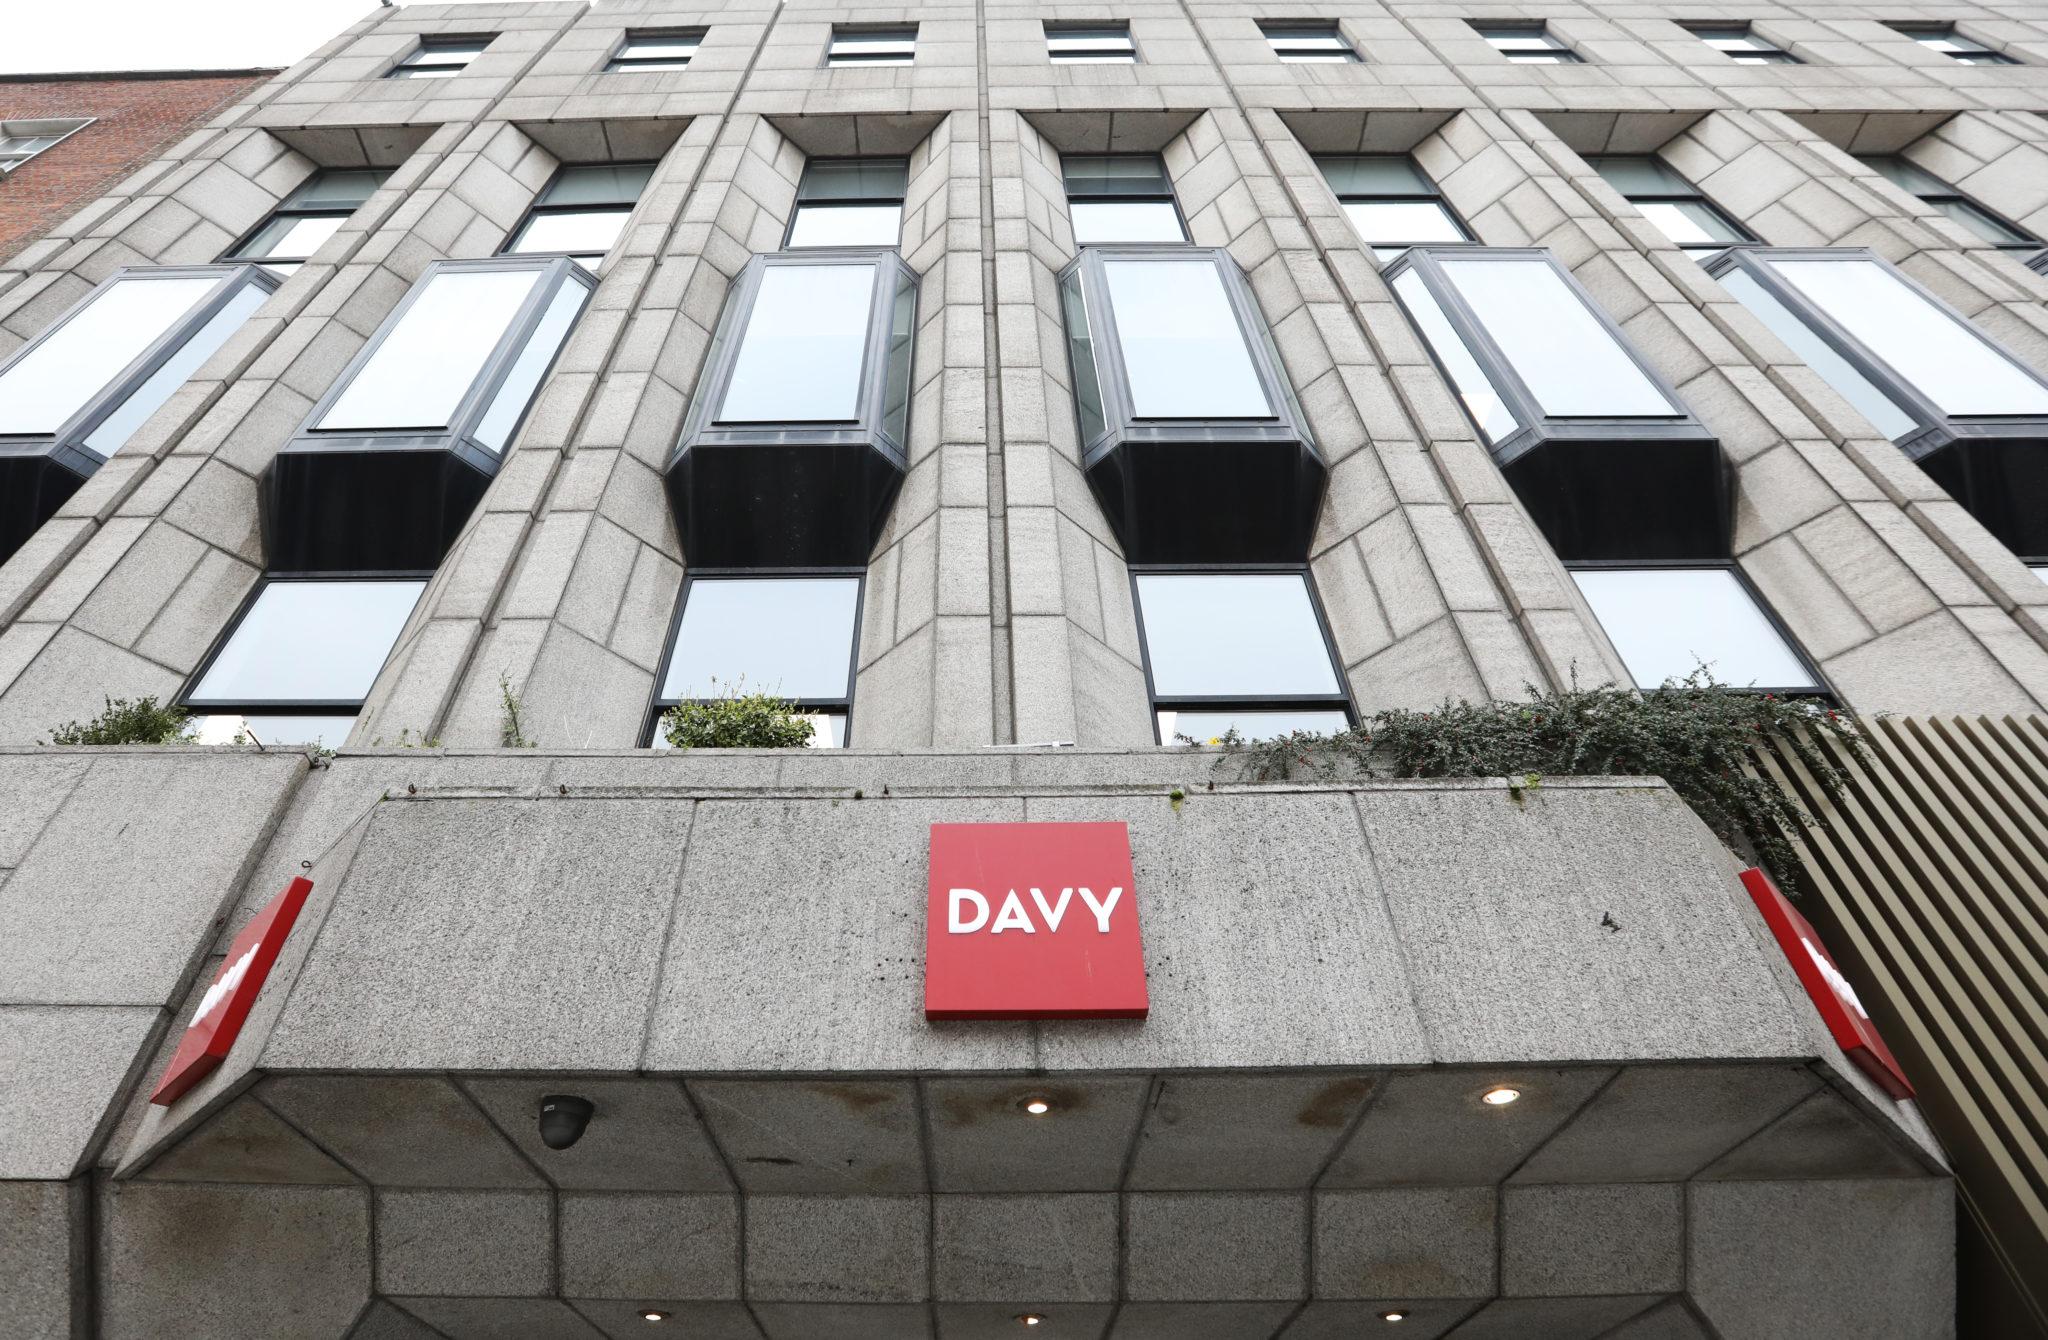 Davy stockbrokers Offices on Dawson street in Dublin